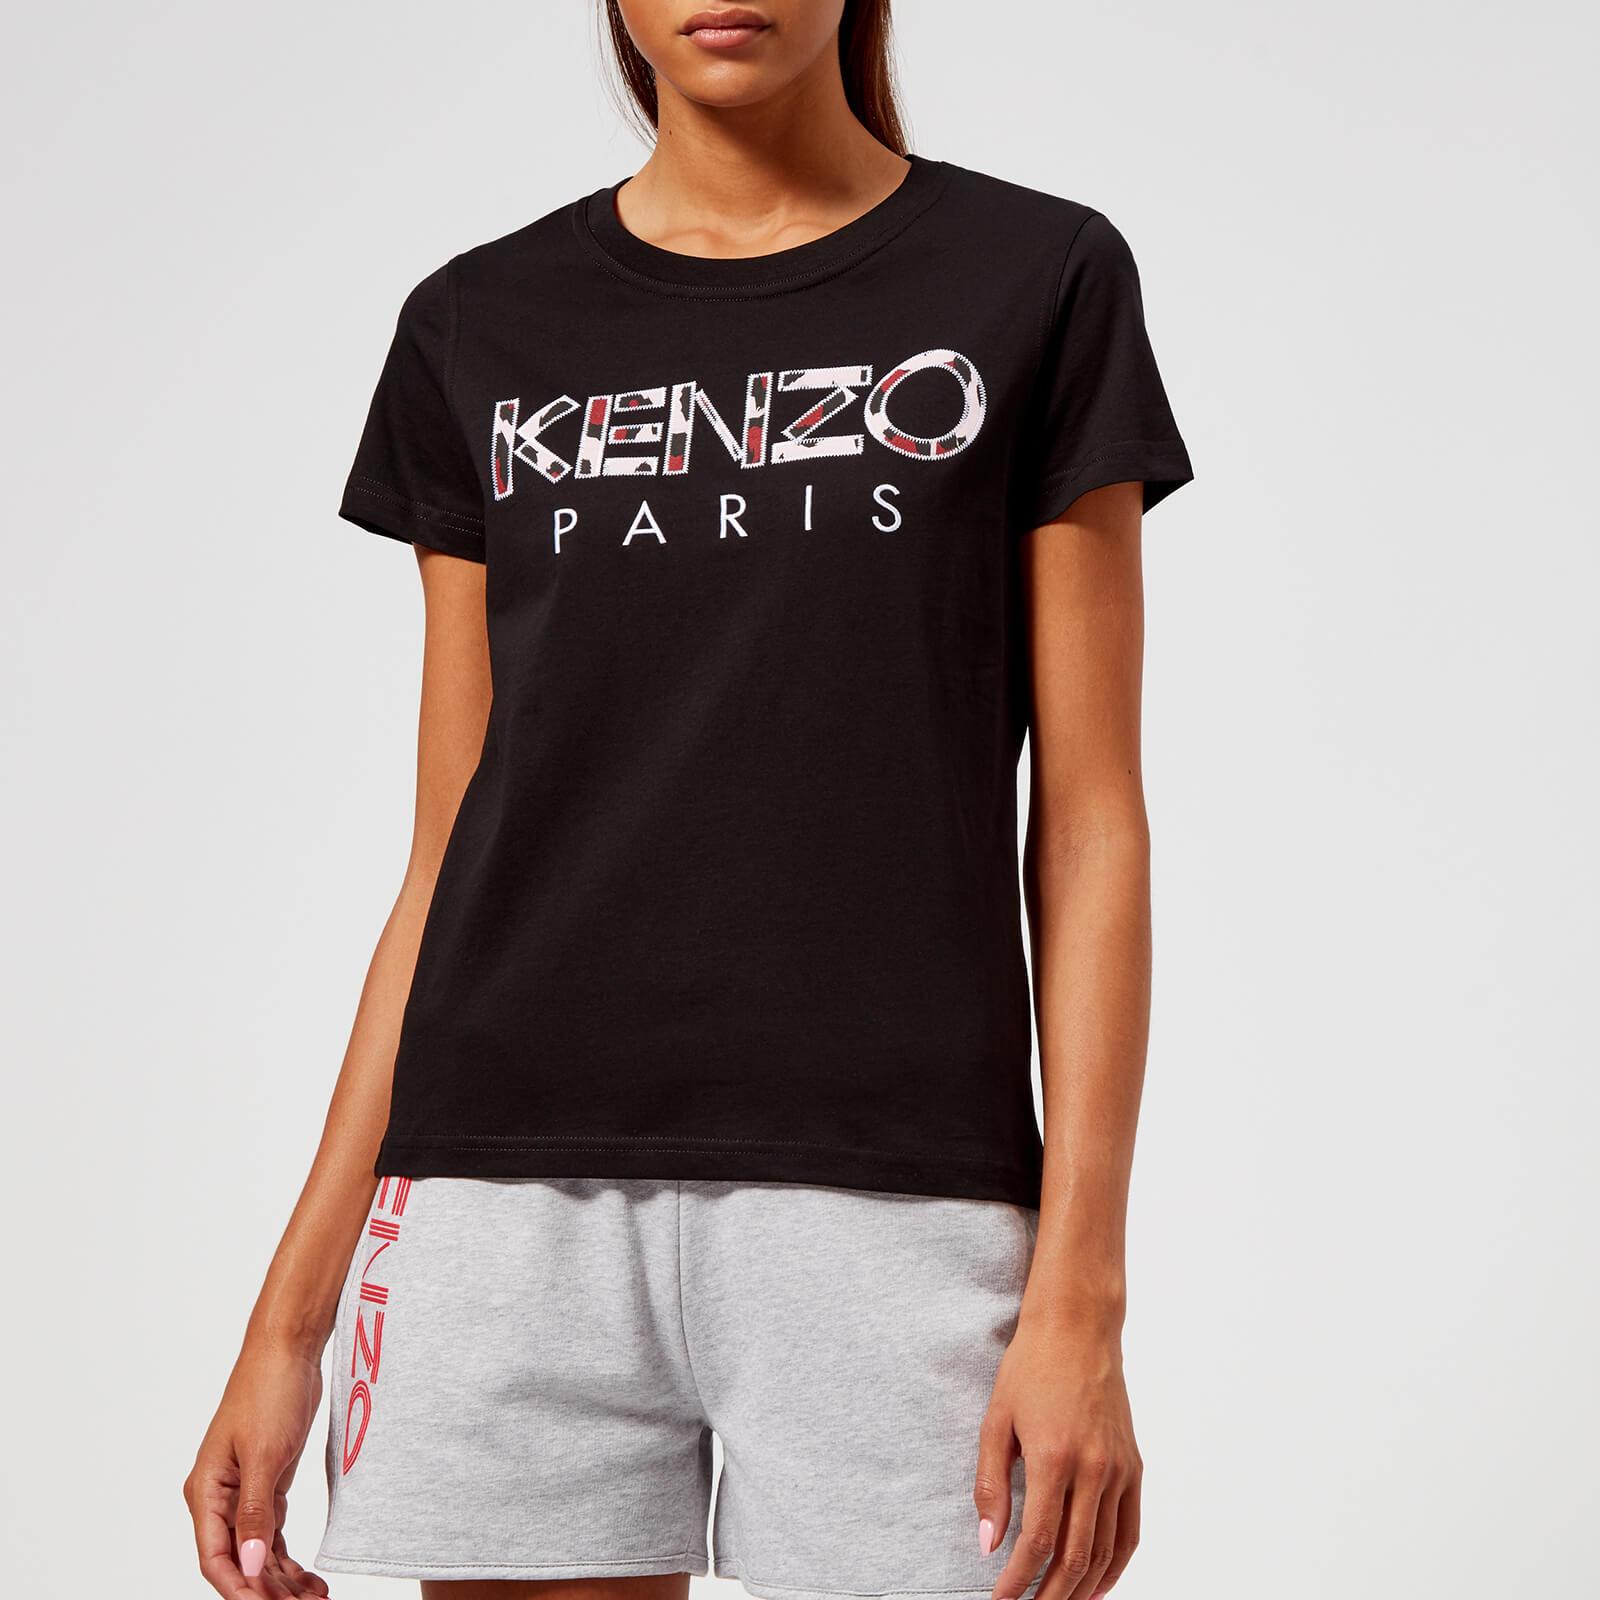 64edb93739c0 KENZO Women's Light Cotton T-Shirt - Black - Free UK Delivery over £50